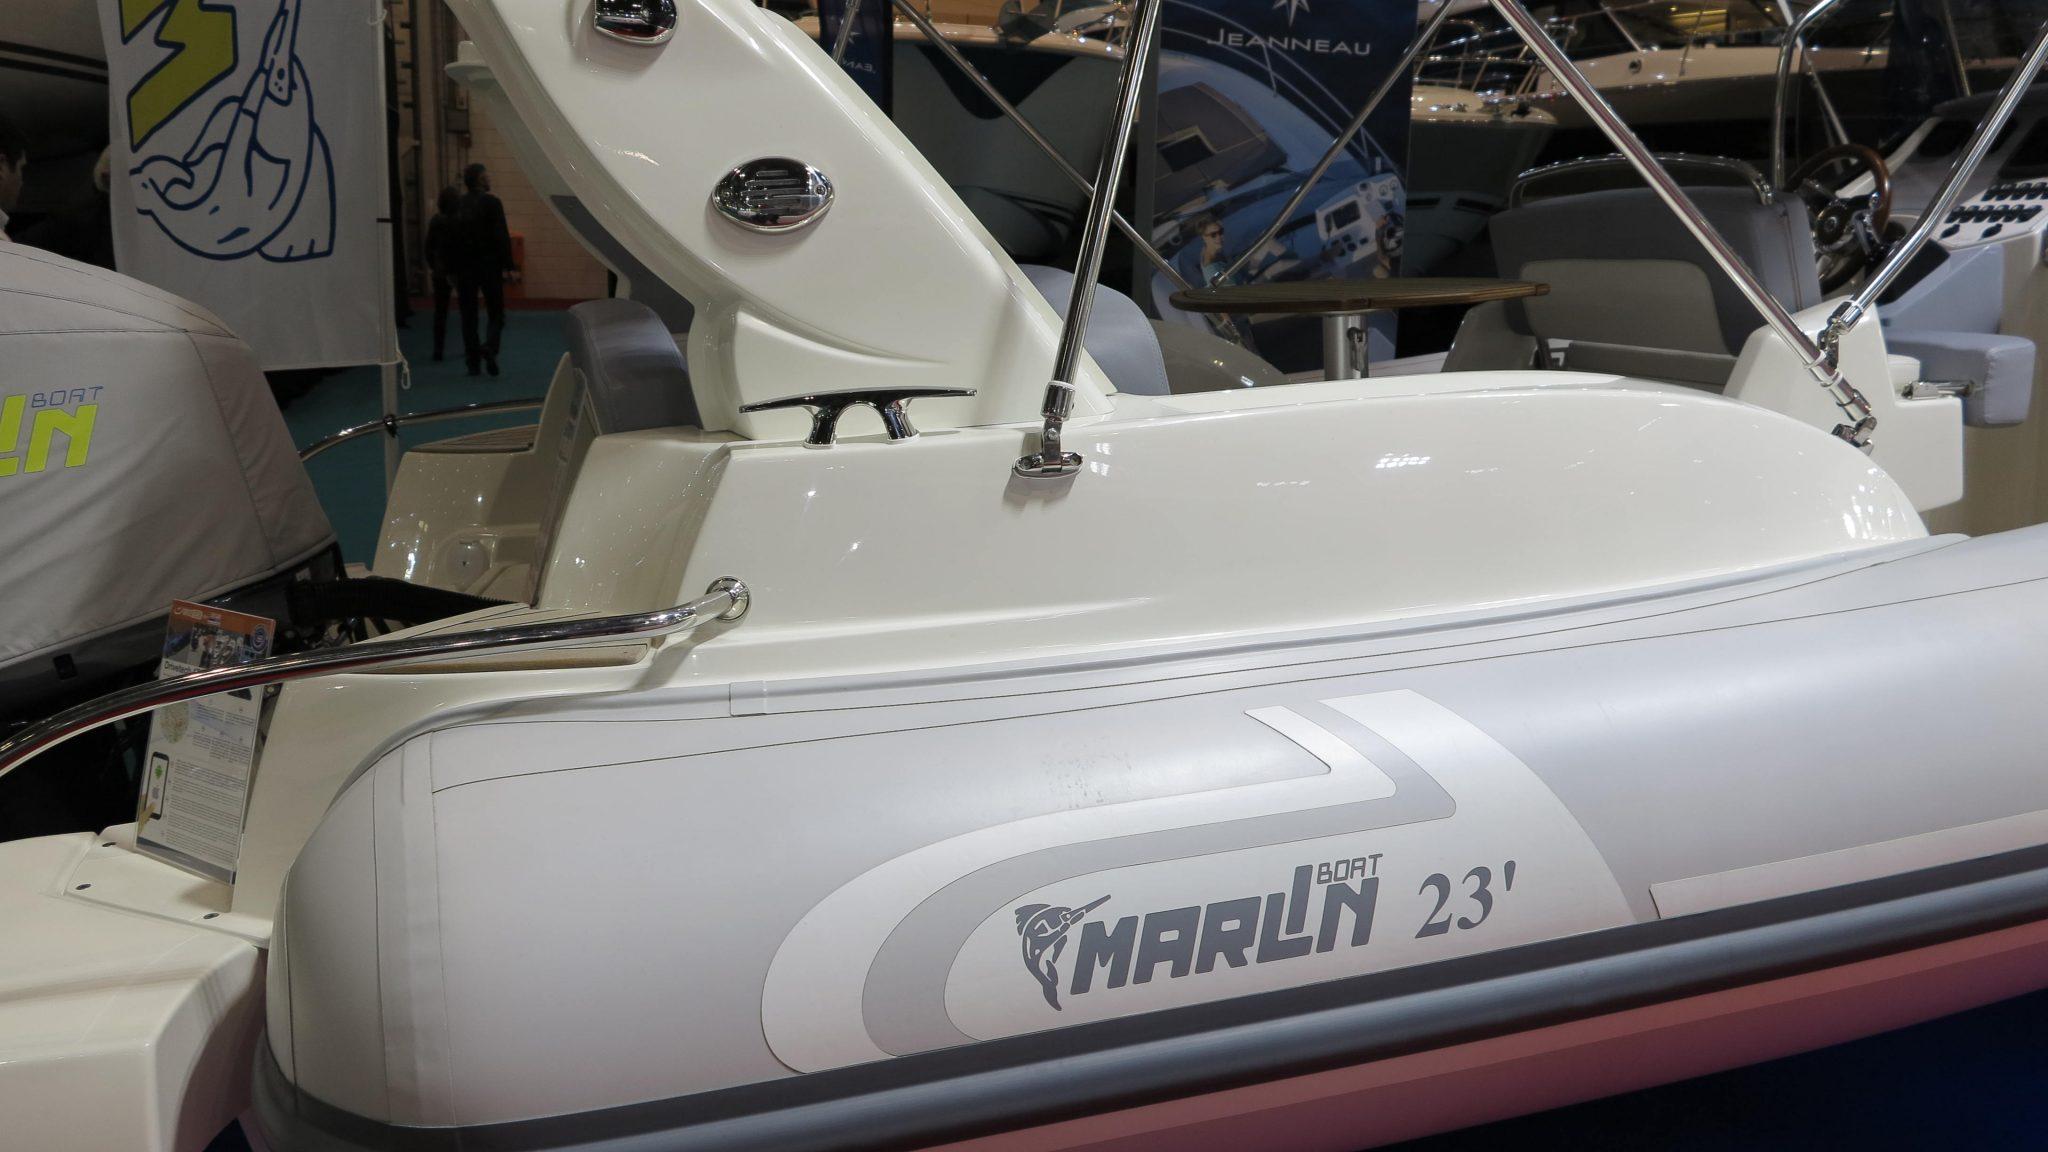 Synthet6ic teak on a Marlin RIB